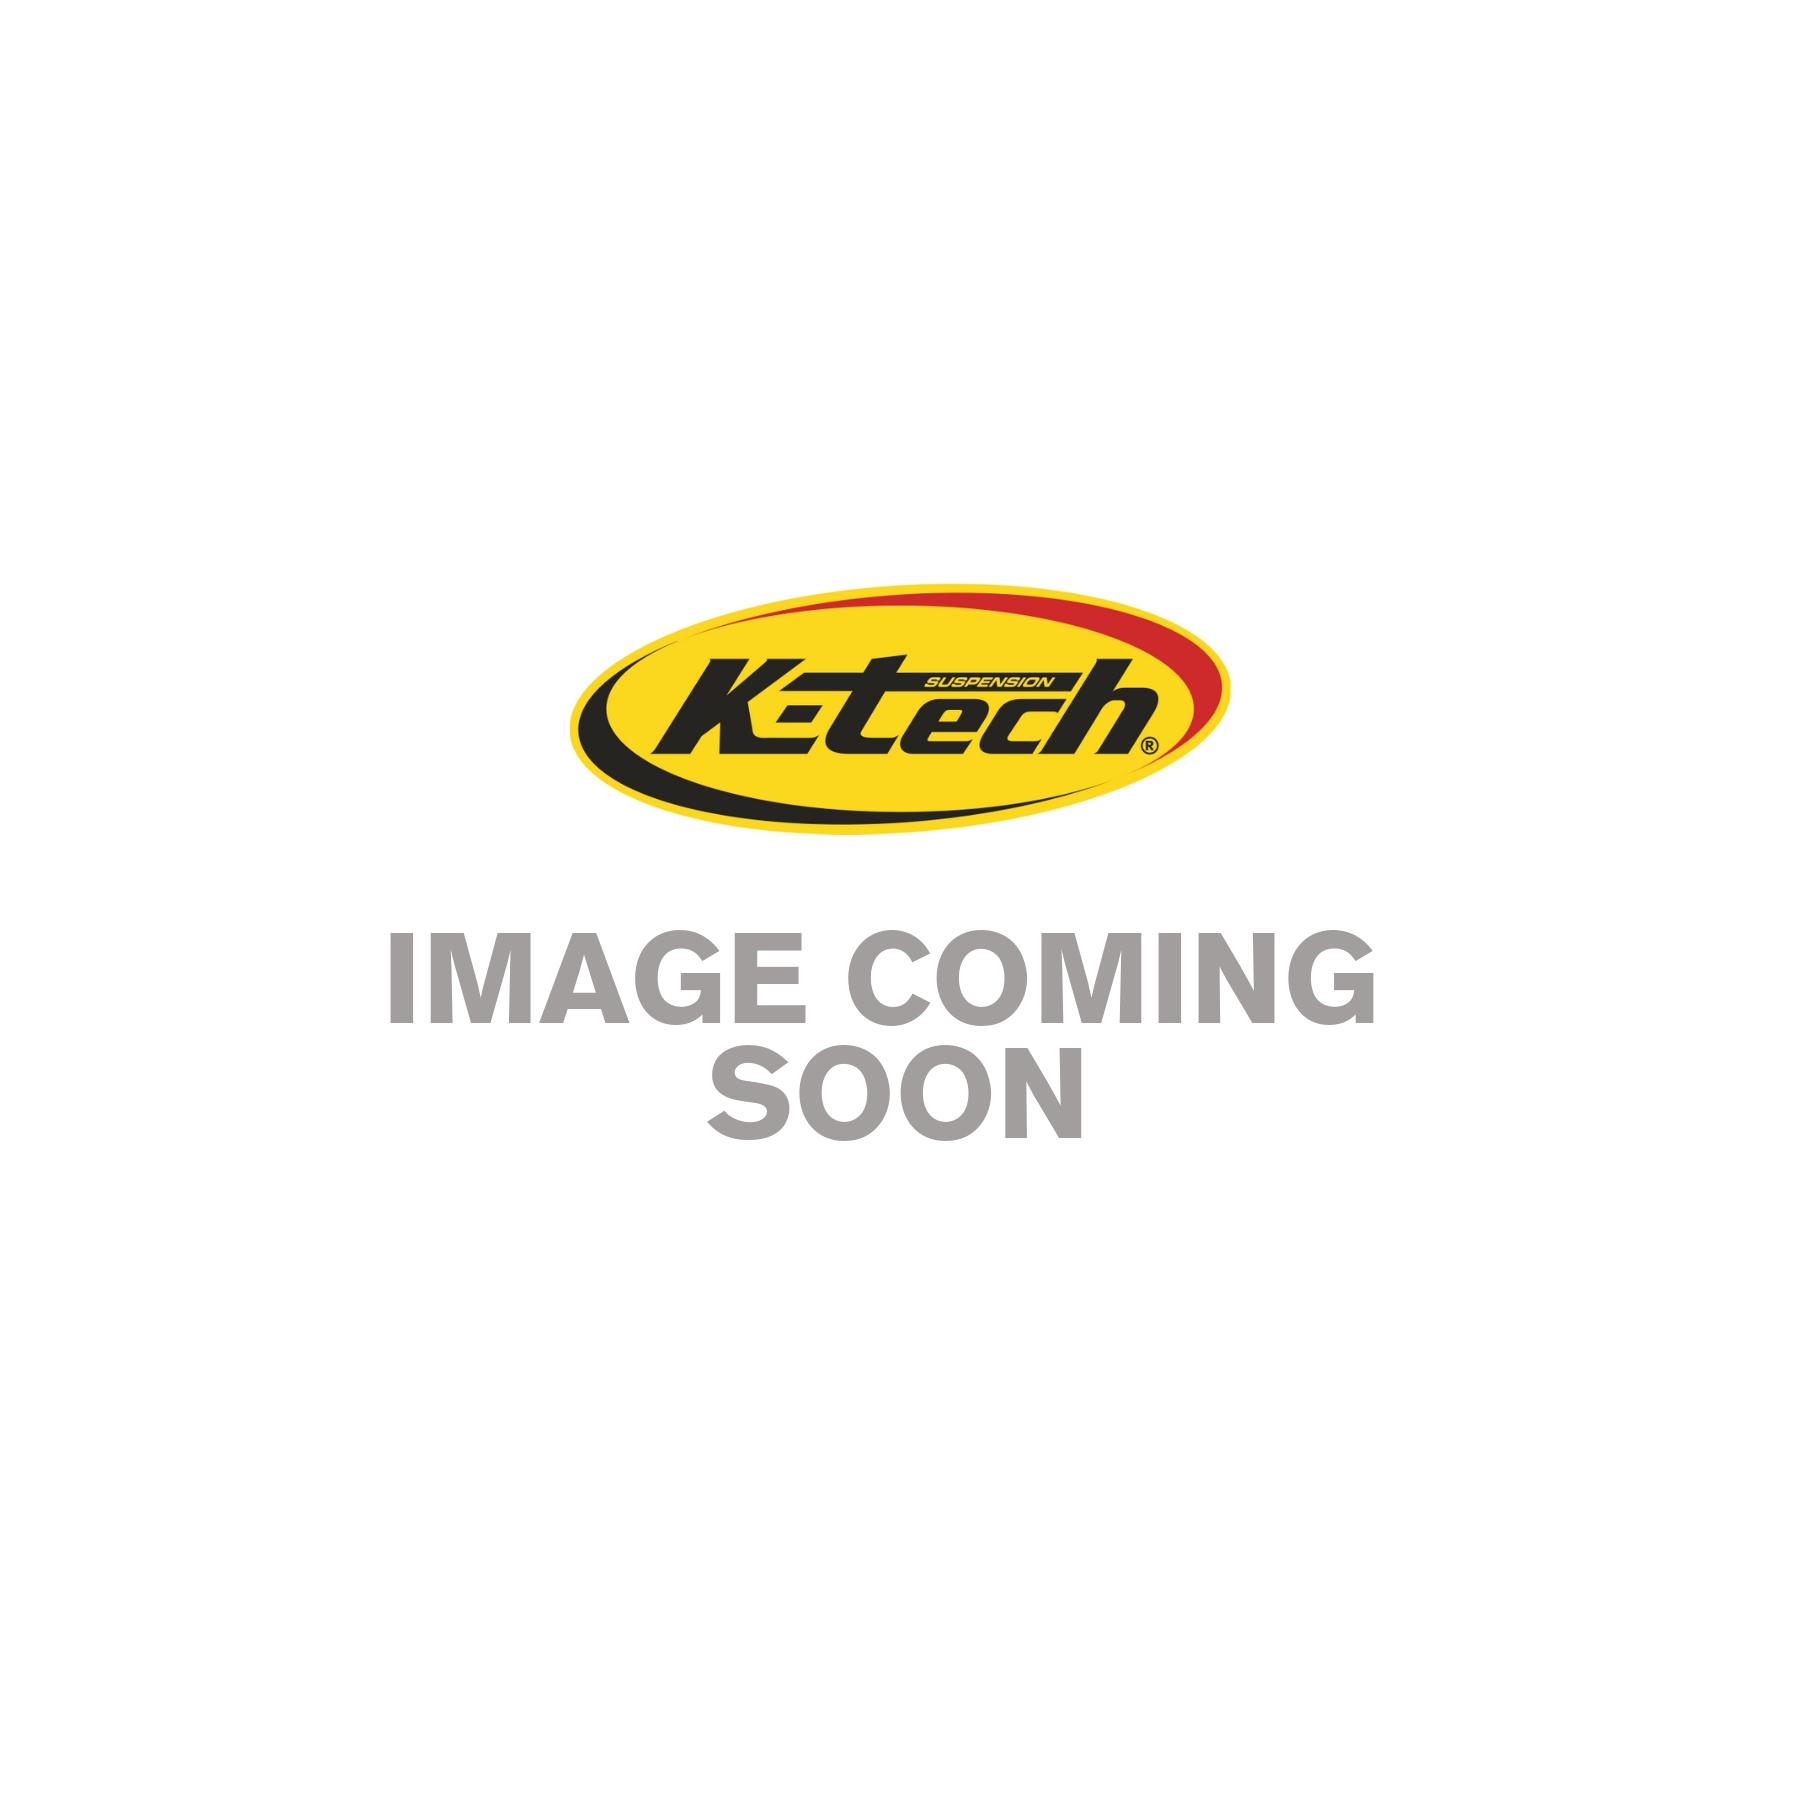 25IDS Front Fork Cartridges KTM 1290 Duke